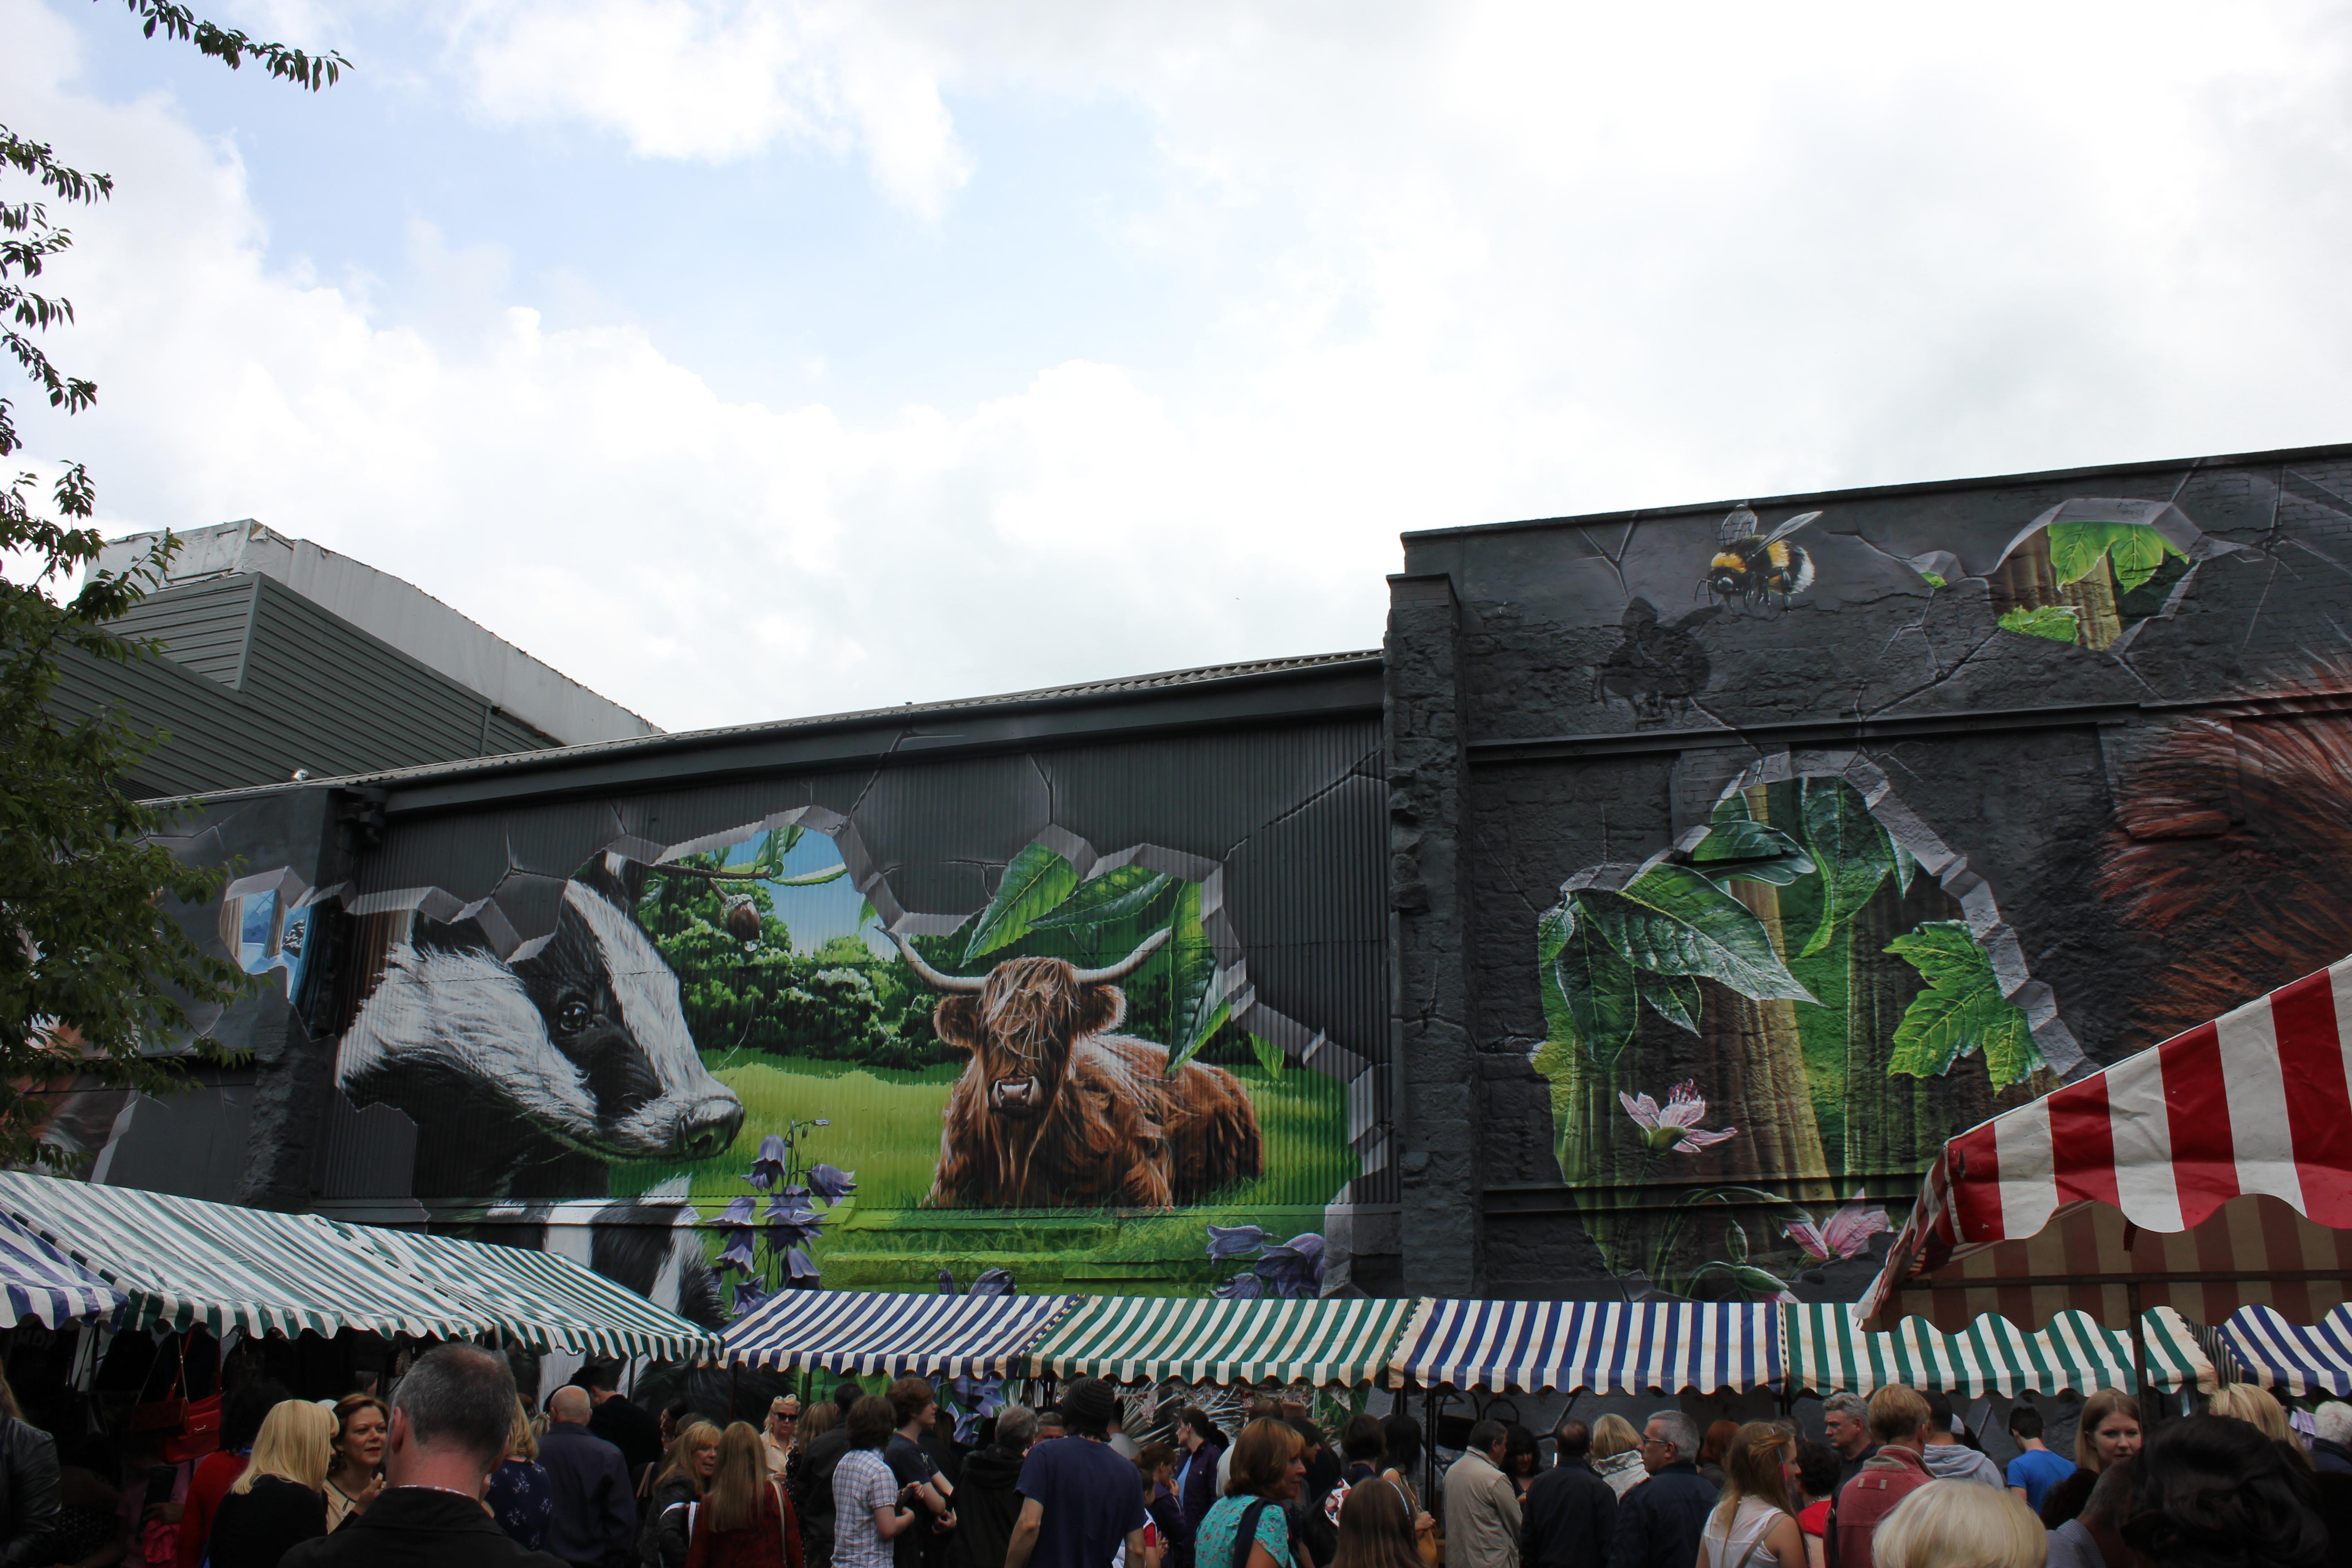 The Vintage Festival 2013 Glasgow